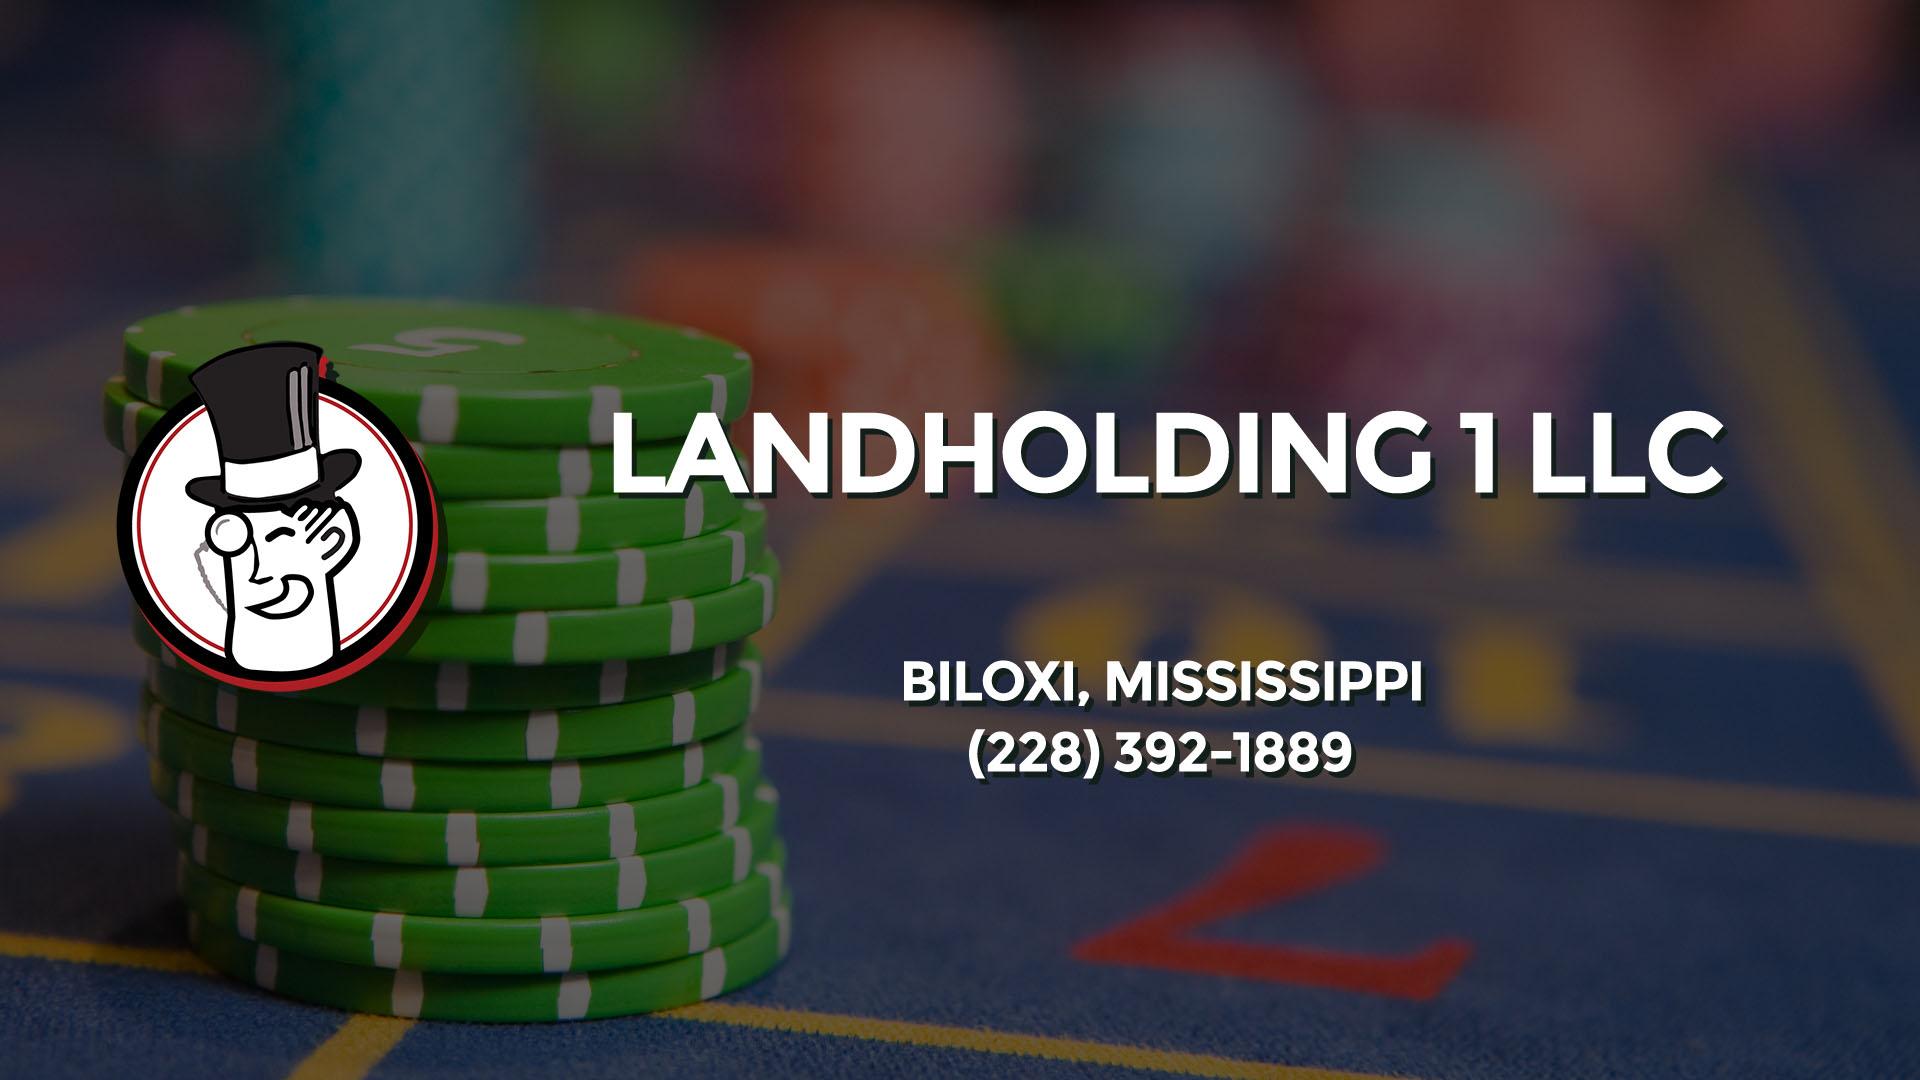 Barons Bus Casino Headers 2051 Landholding 1 Llc Biloxi Ms Jpg